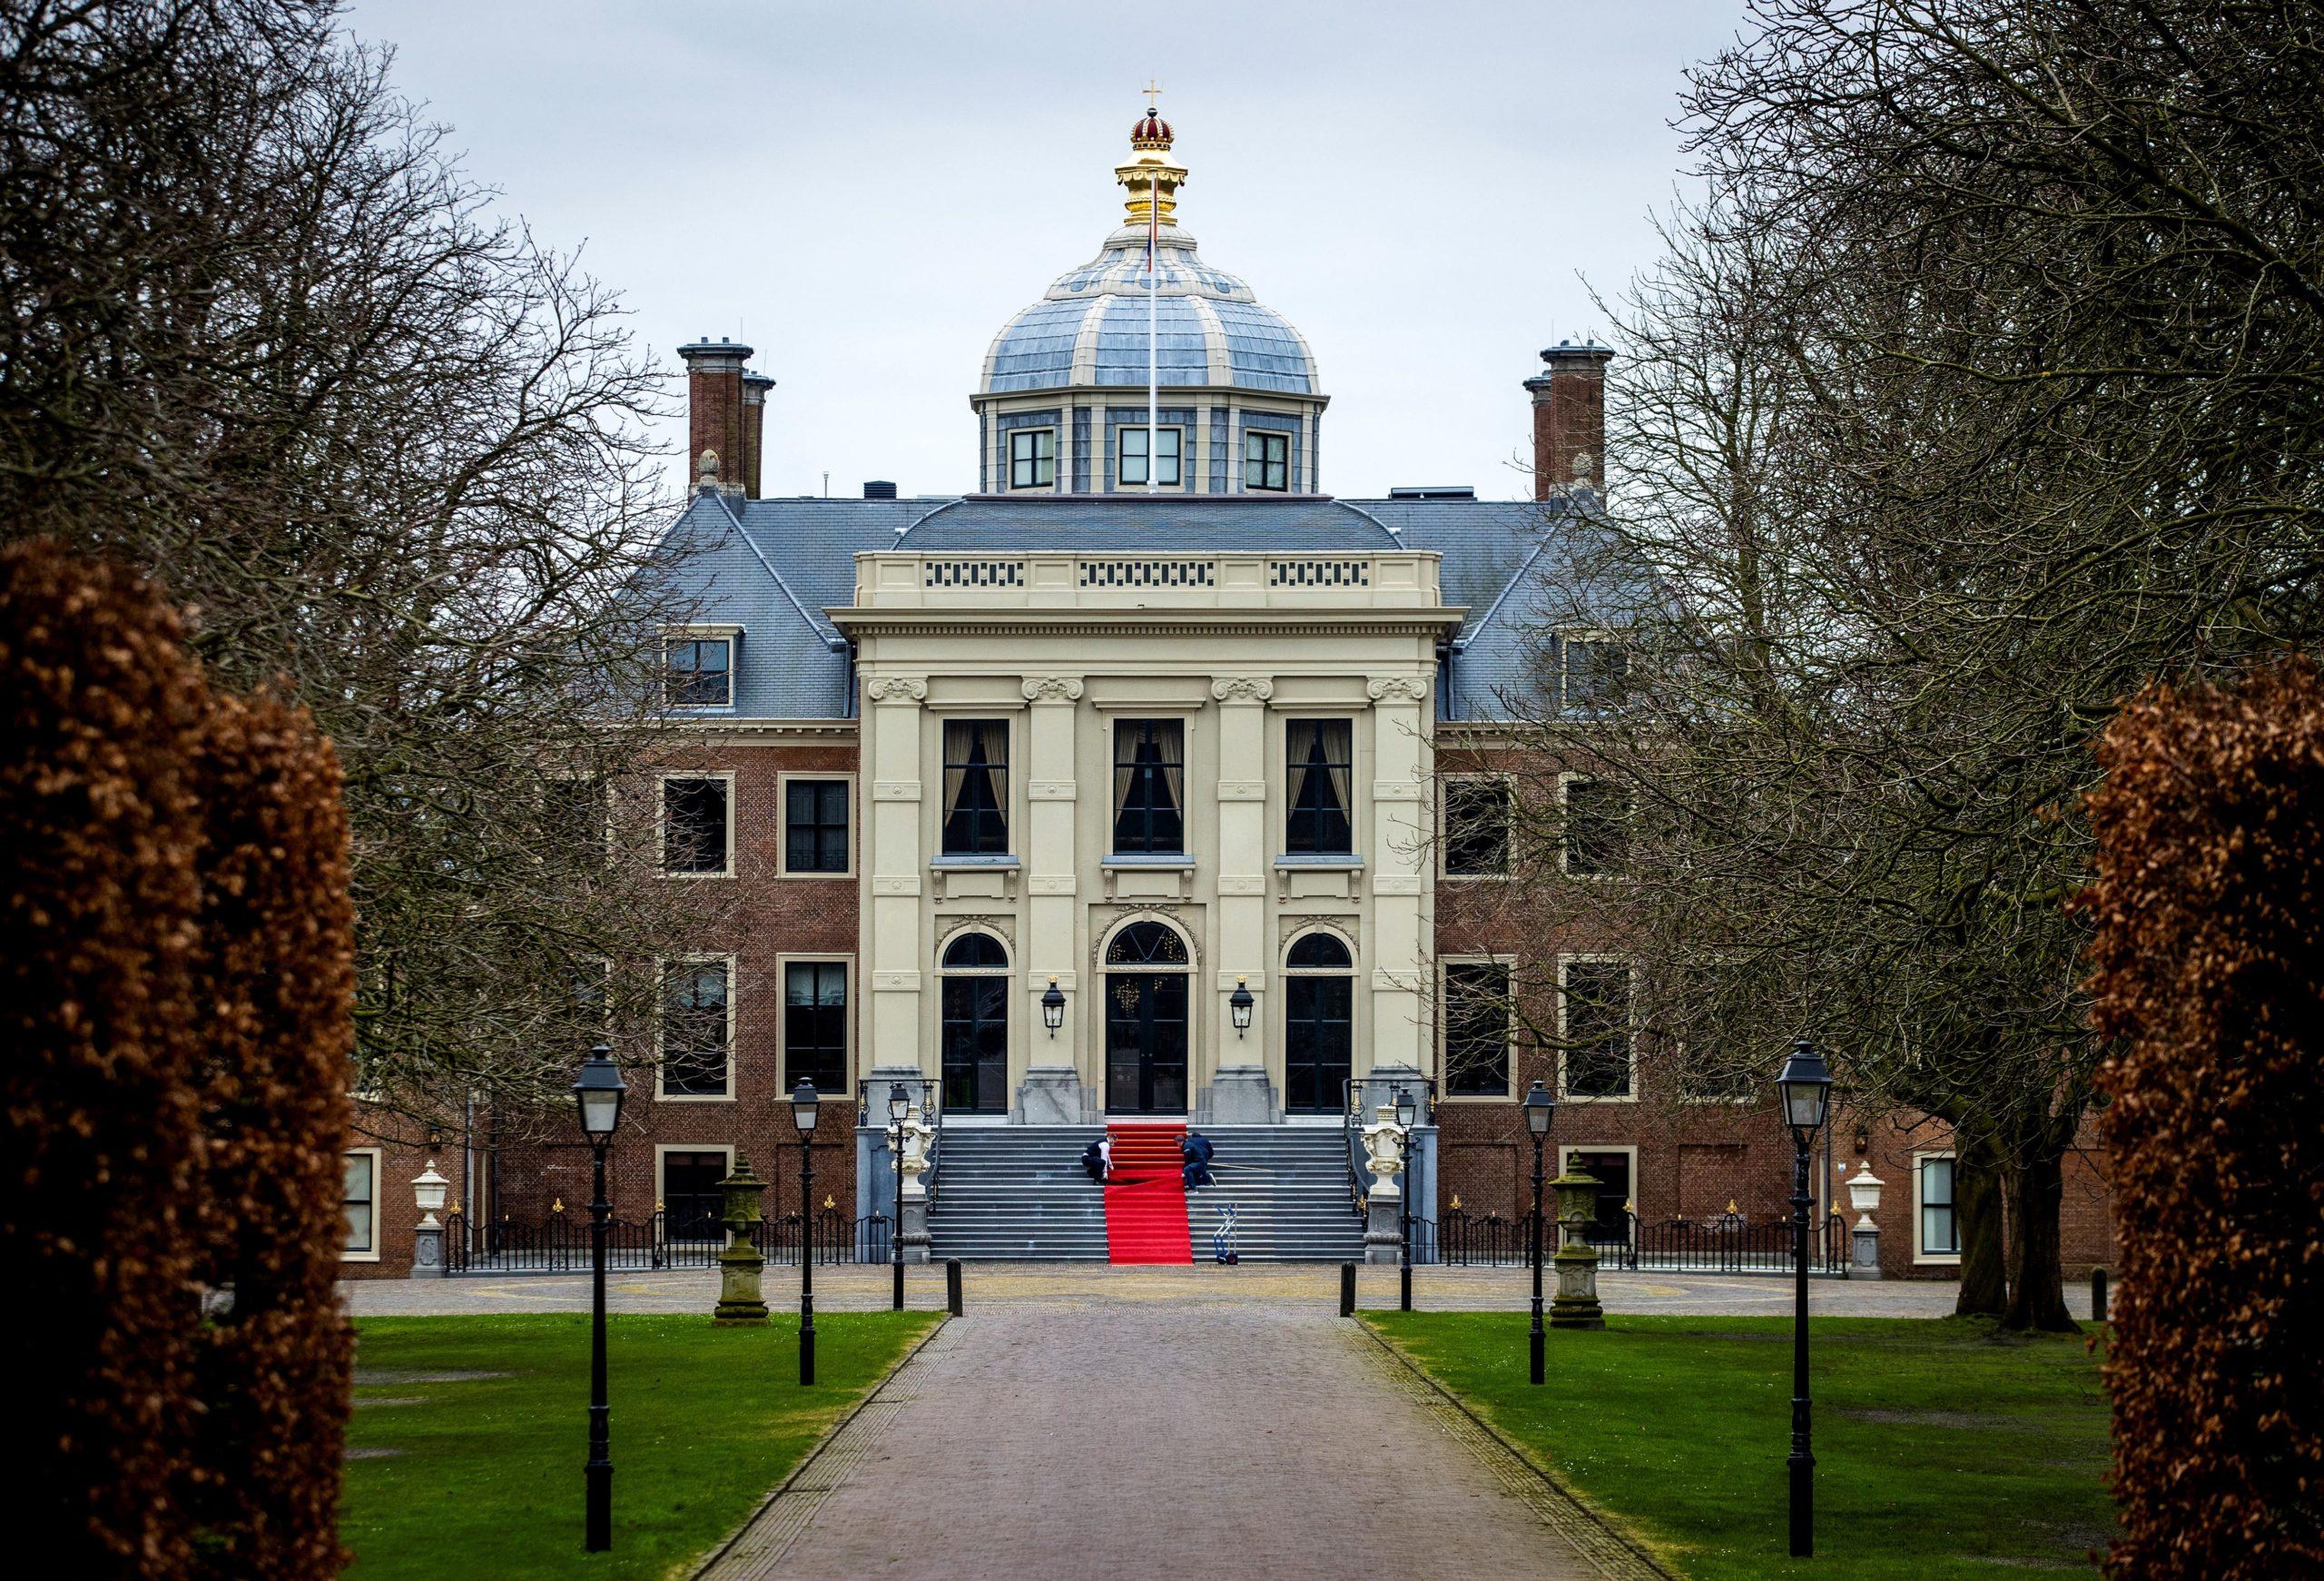 Huis ten Bosch Palace in Netherlands